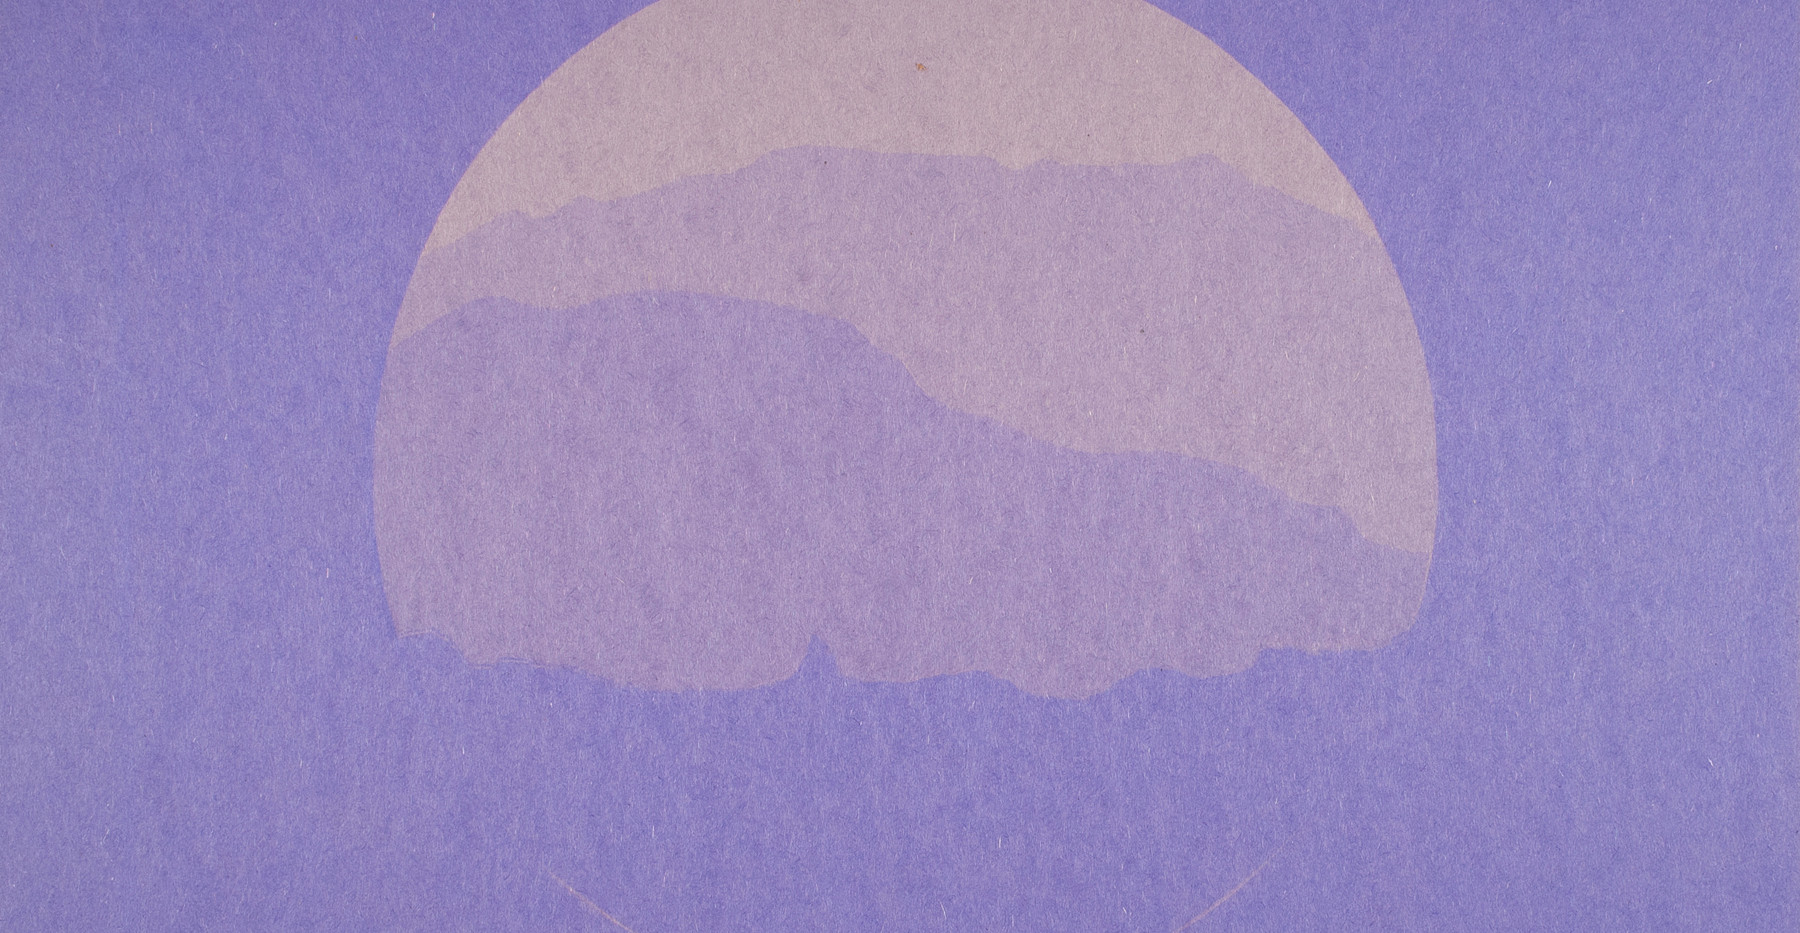 sunprint3.jpg